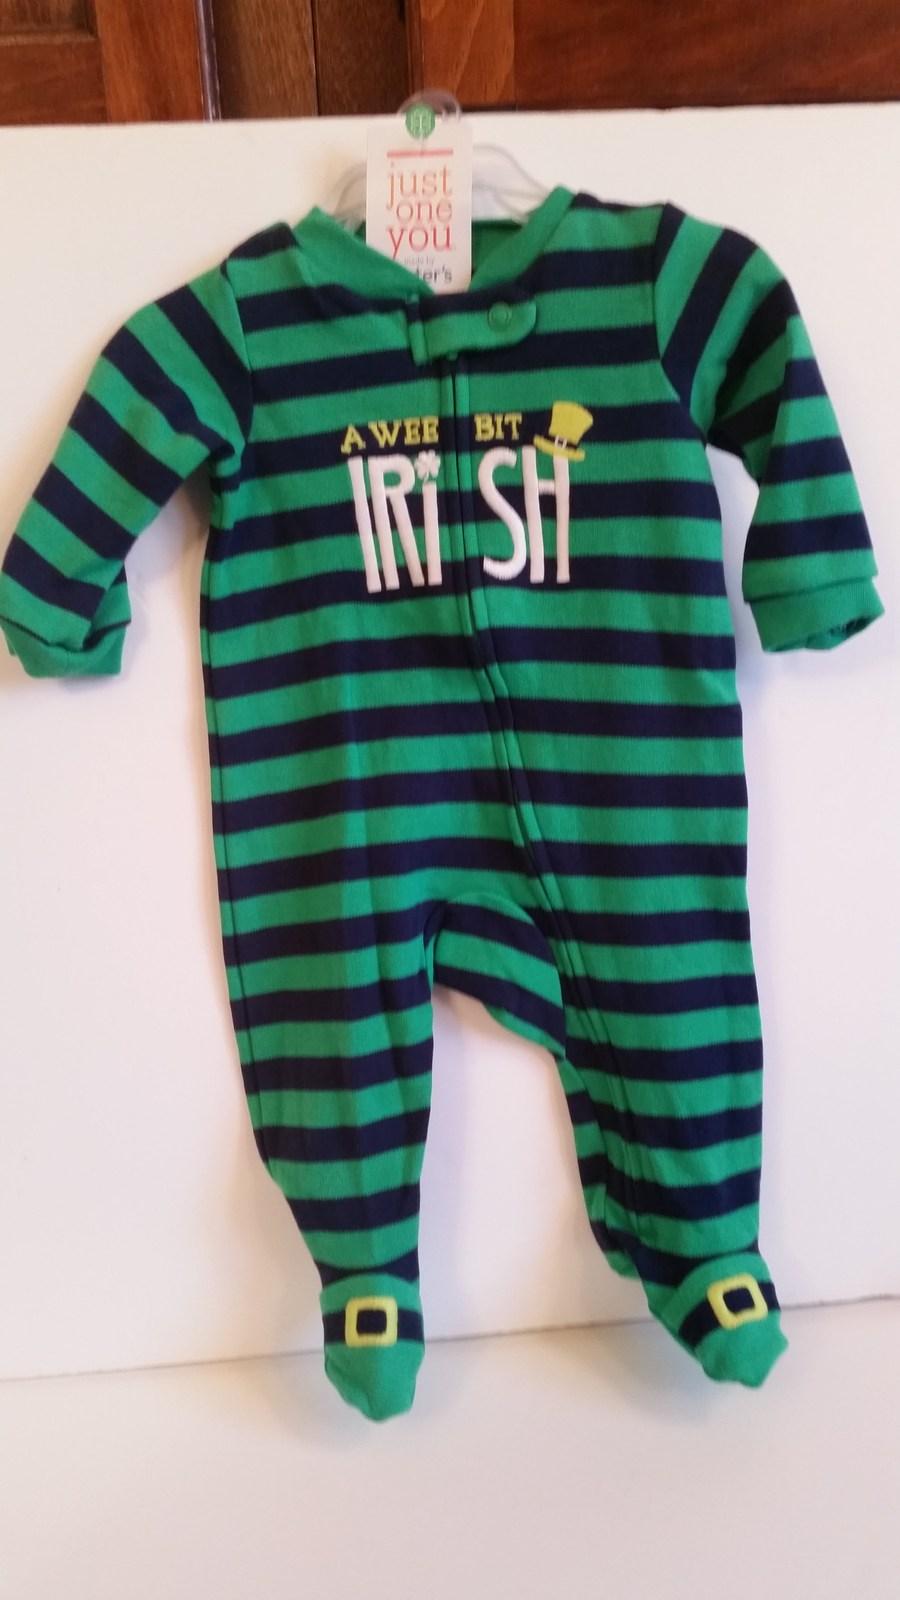 Carters Sleeper night gowns Infant Sz NB Newborn cotton Wee Bit Irish Baby New - $7.99